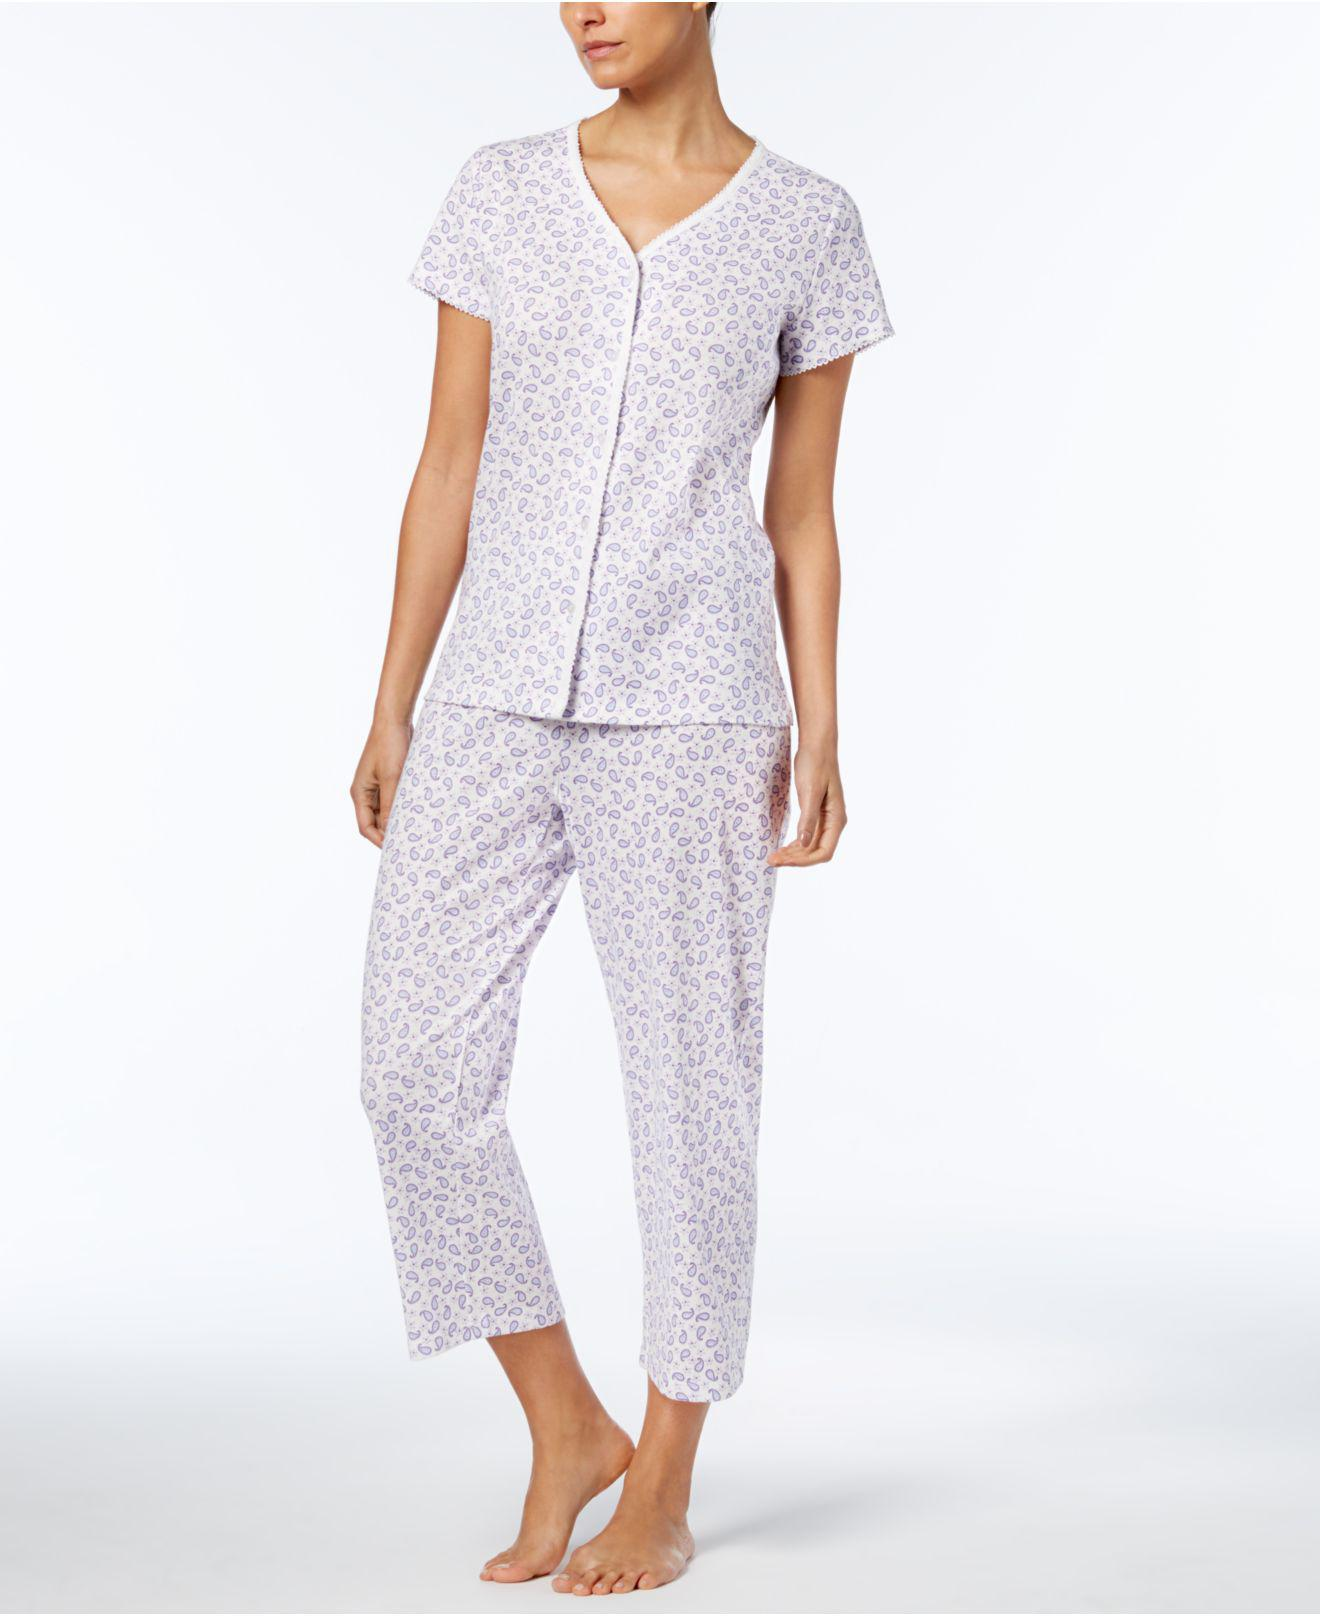 1a0b59c2a8 Lyst - Charter Club Petite Cropped Cotton Pajama Set